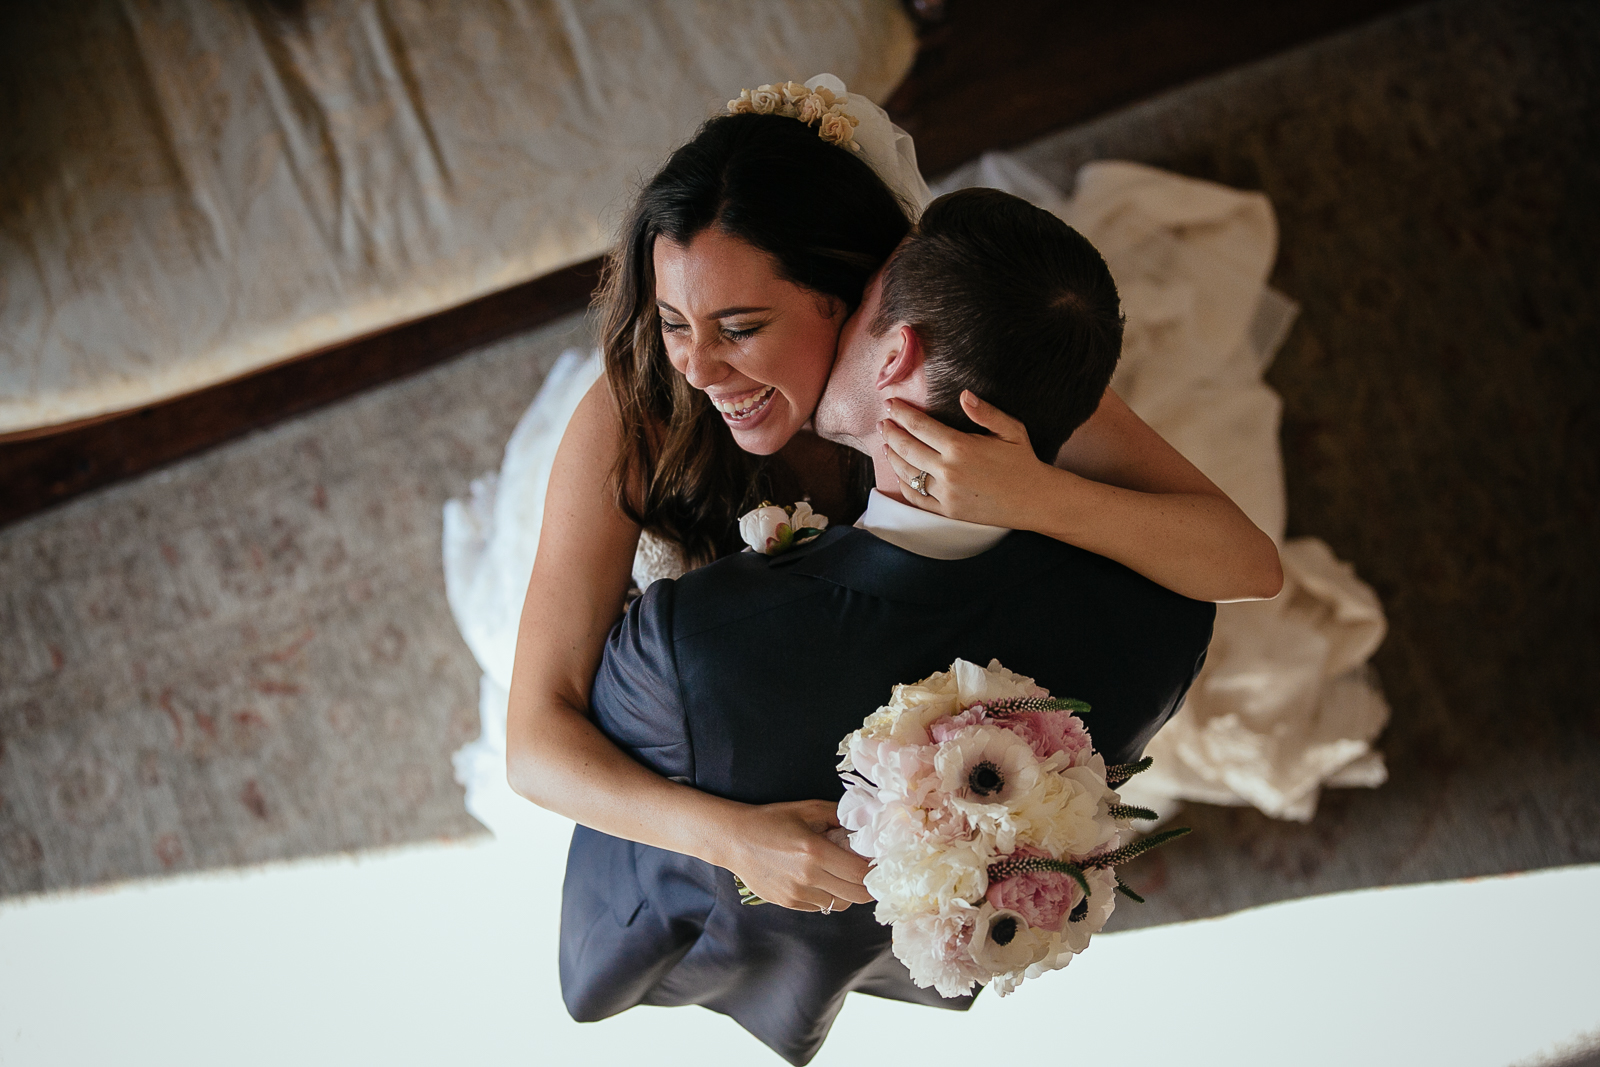 Amanda_&_Steve_Wedding_Darlington_House_La_Jolla_2015_1M2A2608.JPG